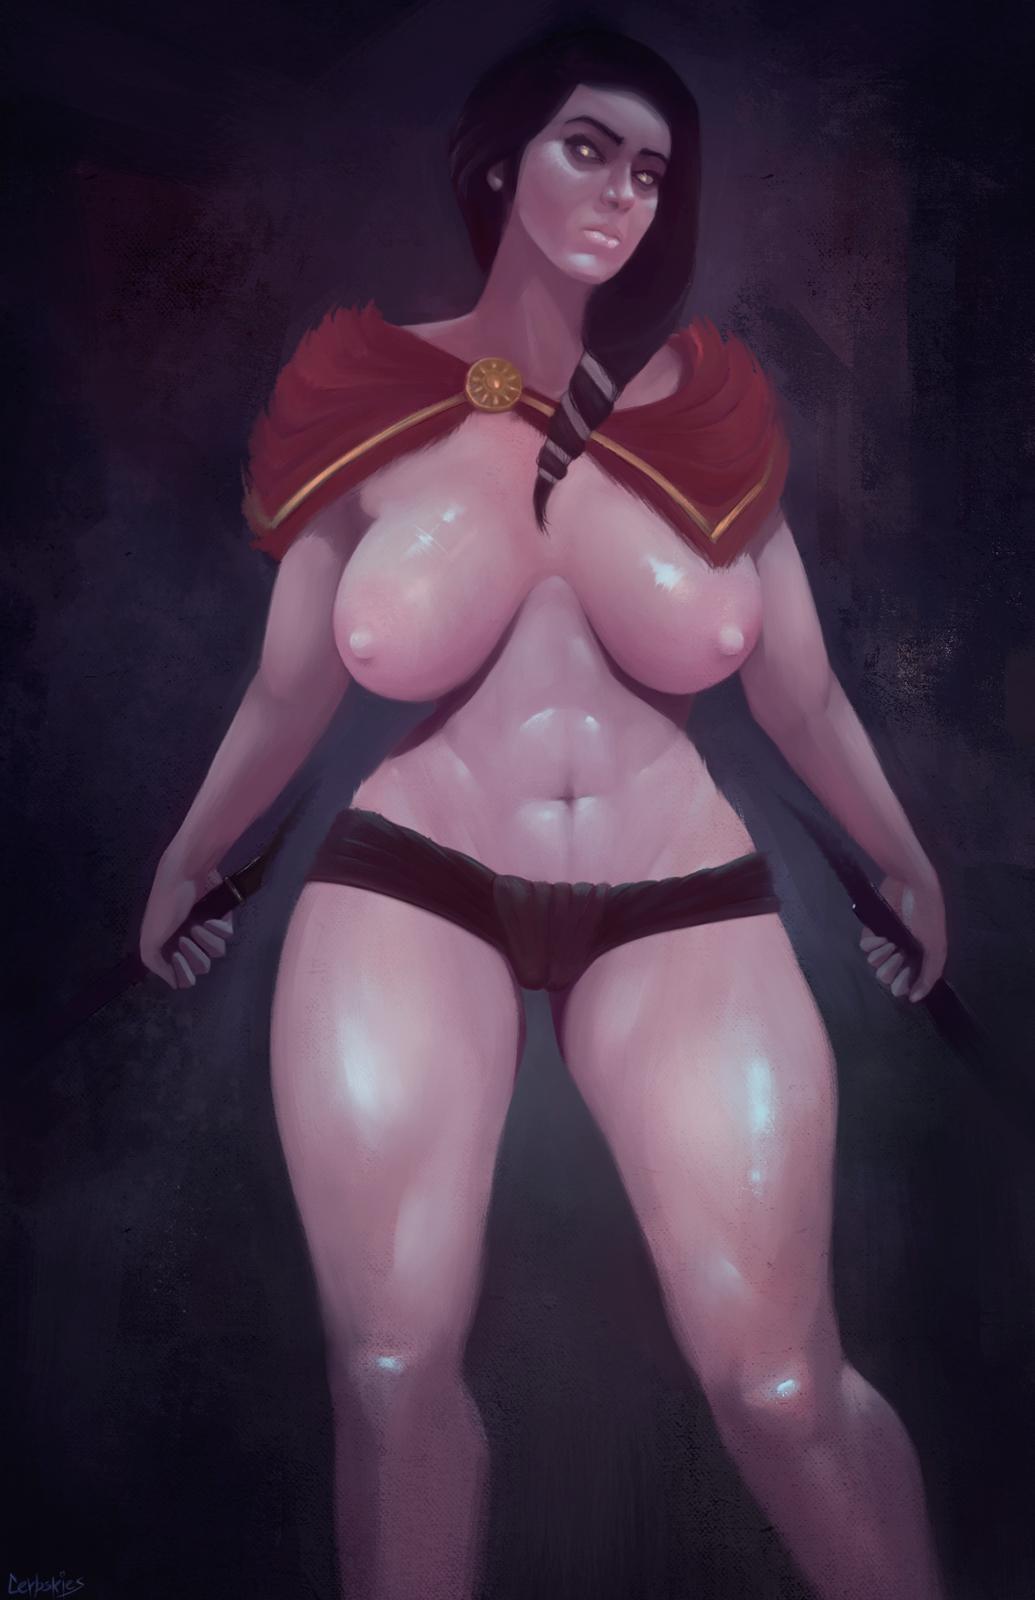 kassandra odyssey assassin's creed naked Breath of the wild laflat